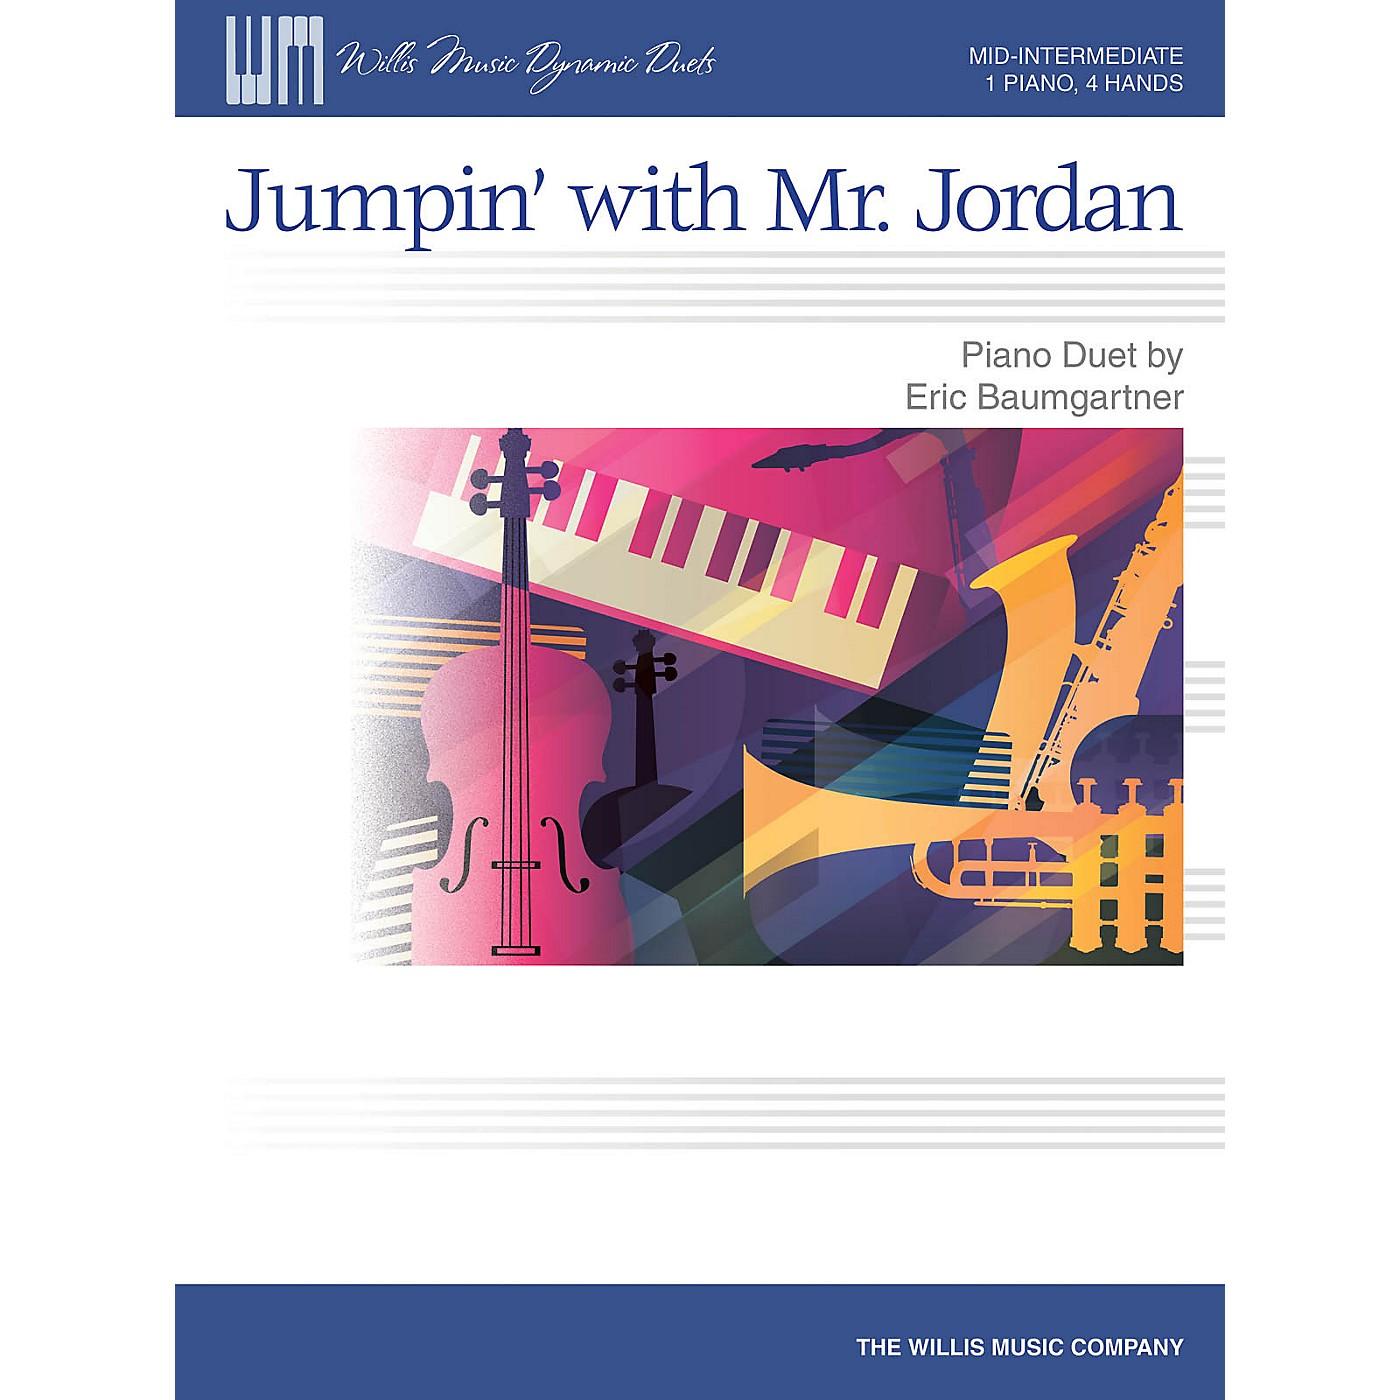 Willis Music Jumpin' with Mr. Jordan - Mid-Intermediate Level Piano Duet - 1 Piano, 4 Hands by Eric Baumgartner thumbnail